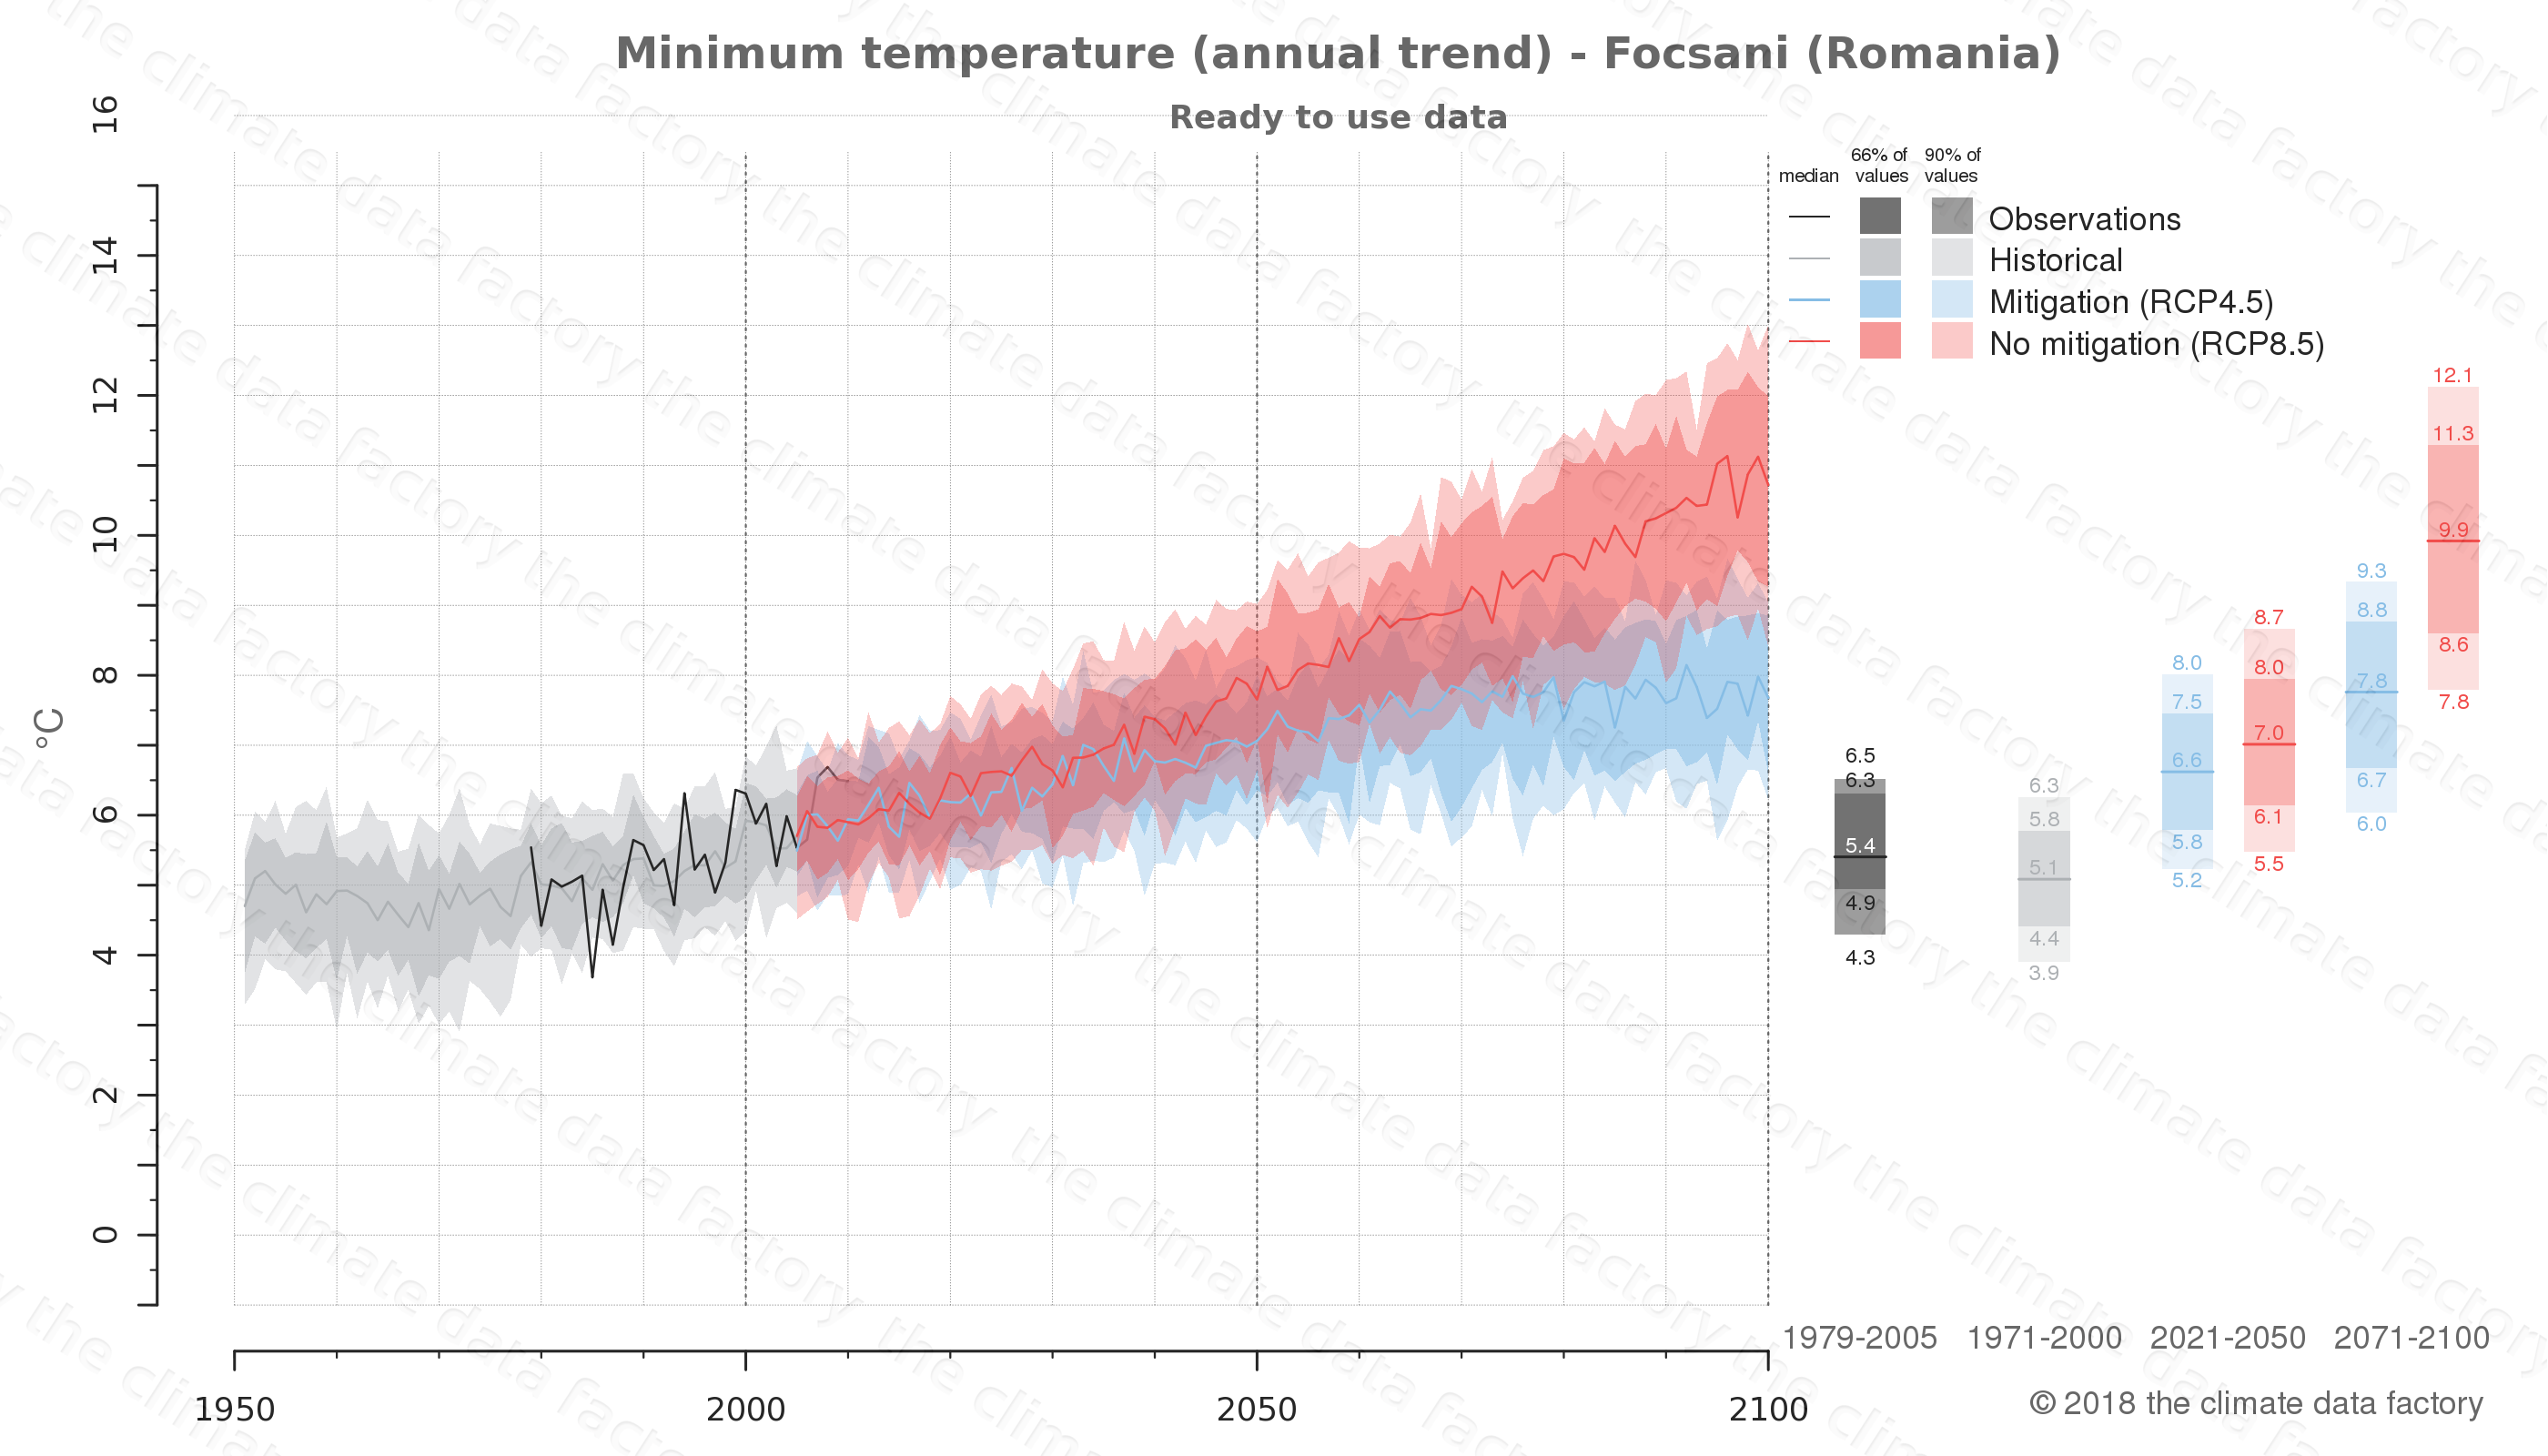 climate change data policy adaptation climate graph city data minimum-temperature focsani romania